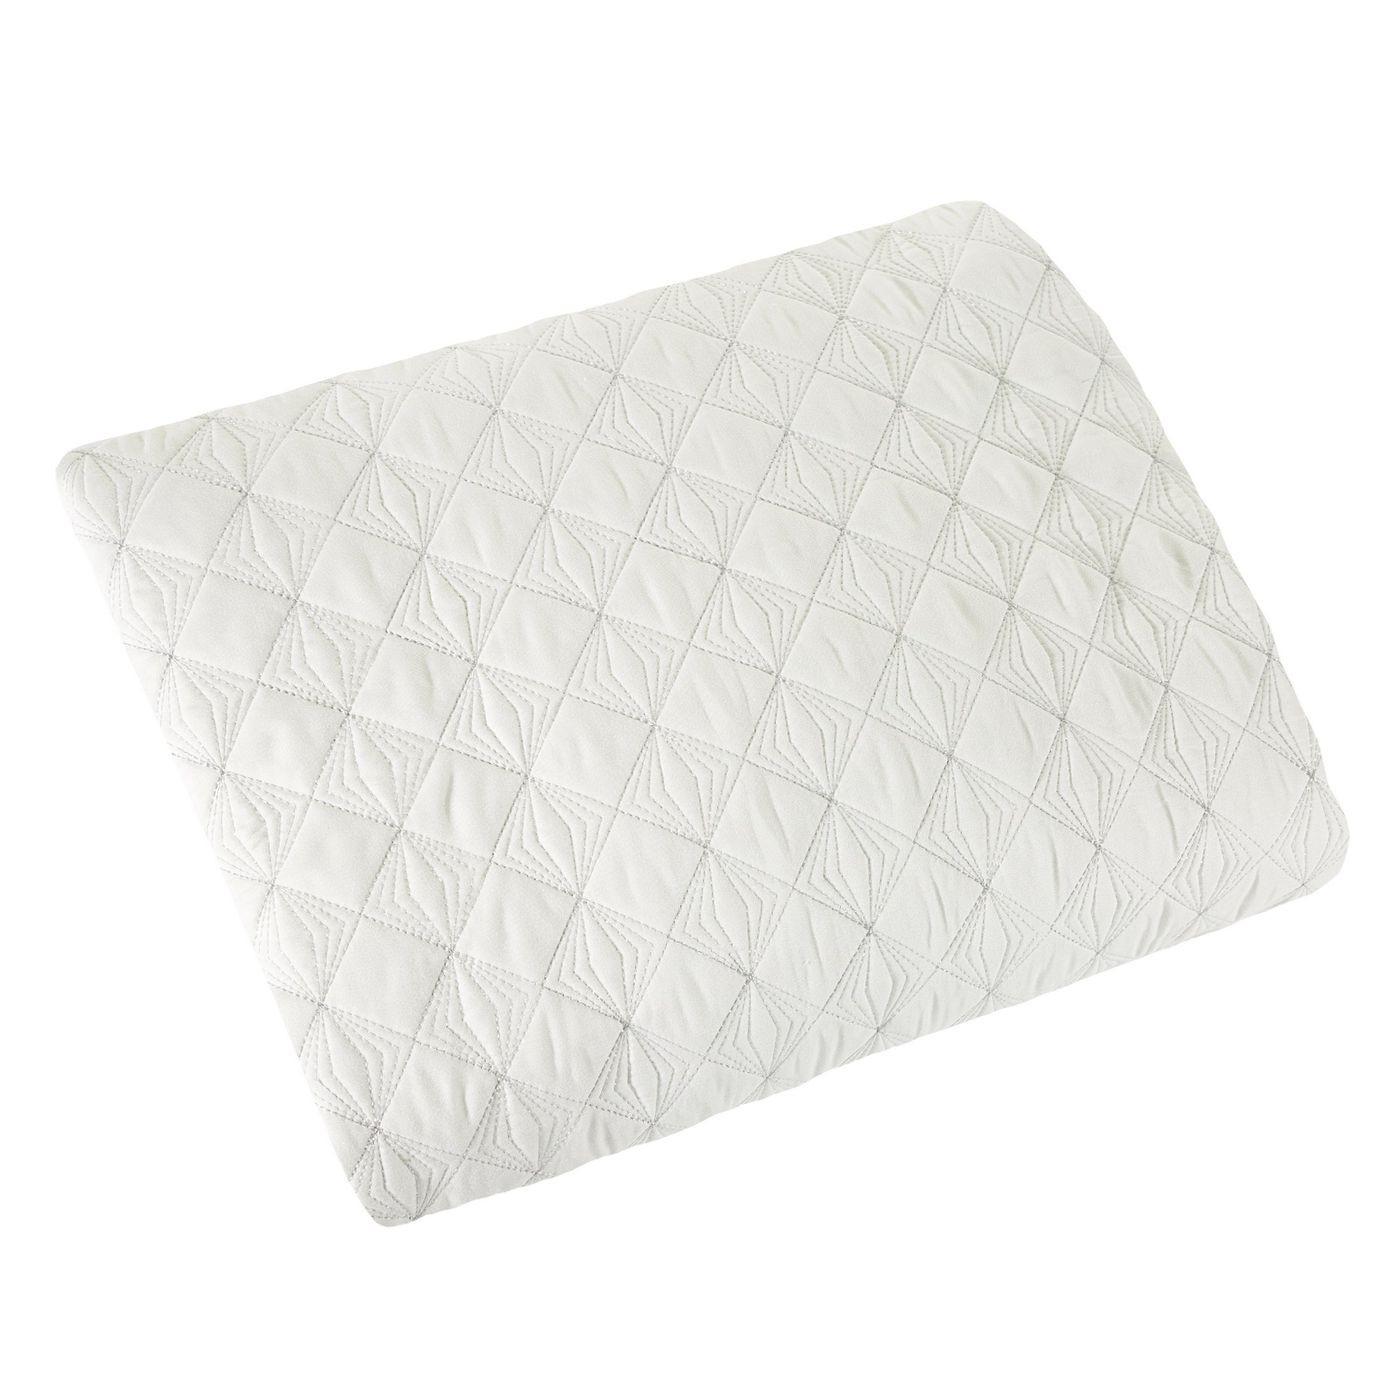 Narzuta na łóżko pikowana srebrna nić 170x210 cm biała